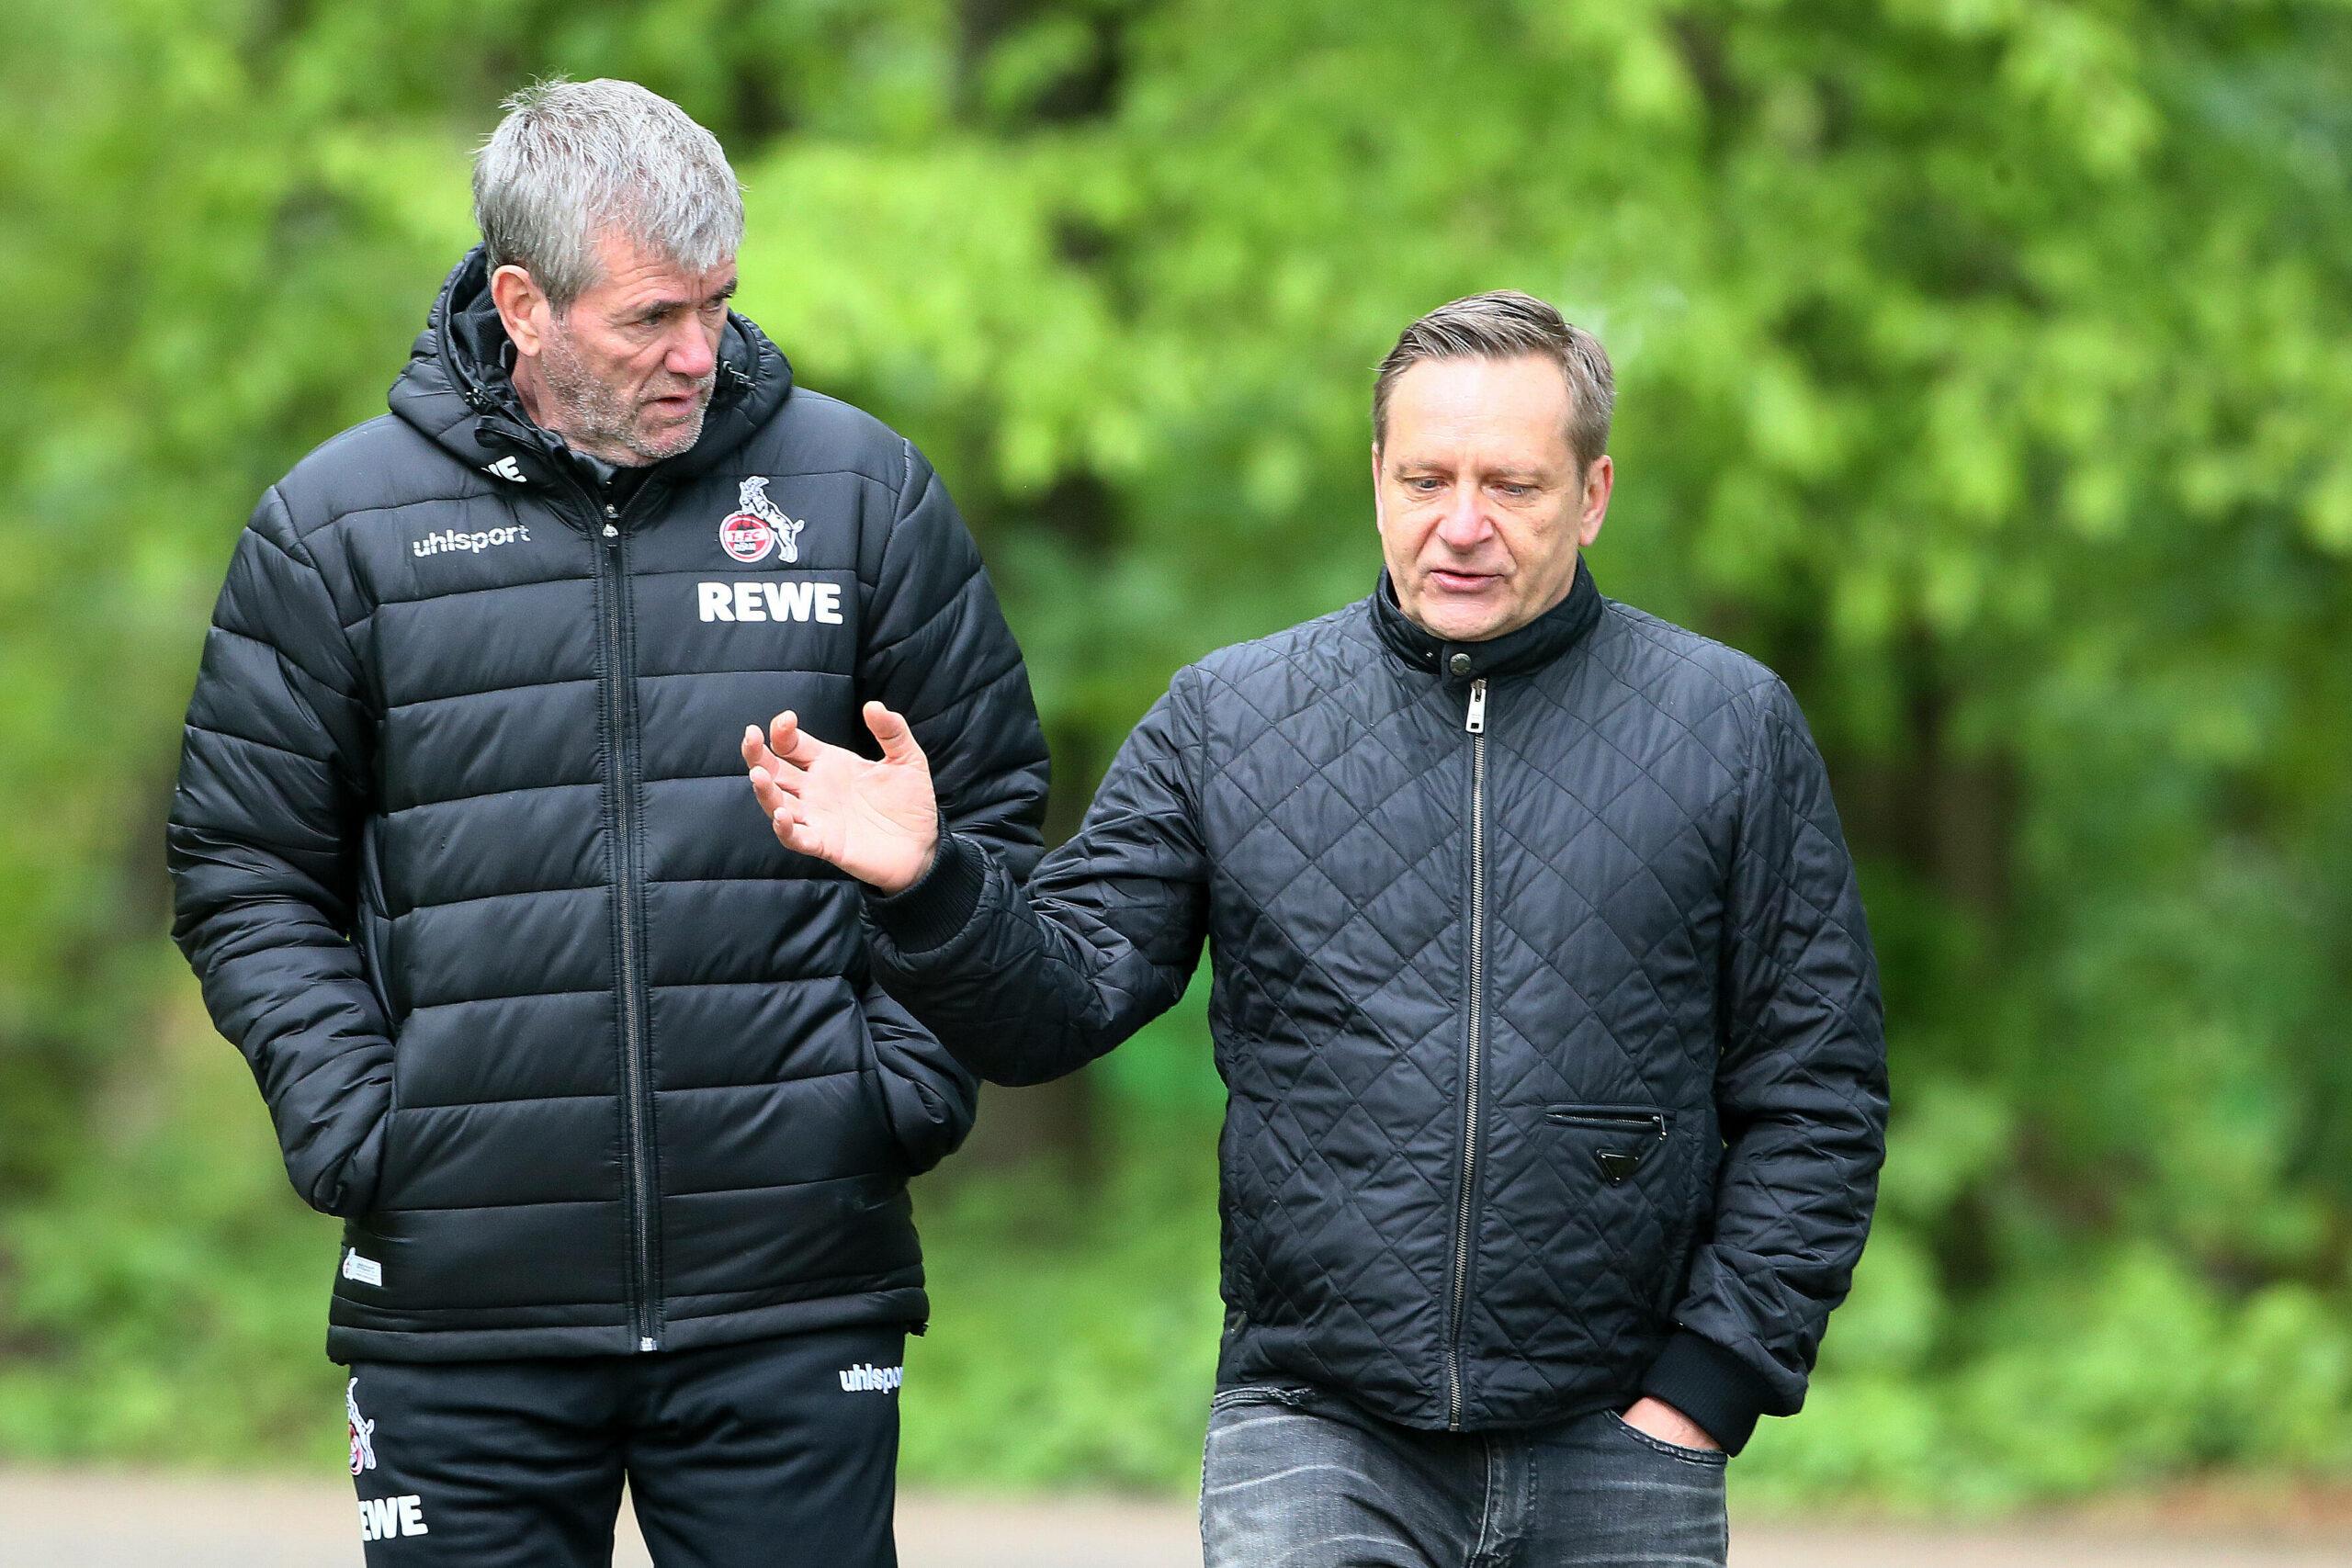 Funkel, Held (beide 1. FC Köln) im Gespräch